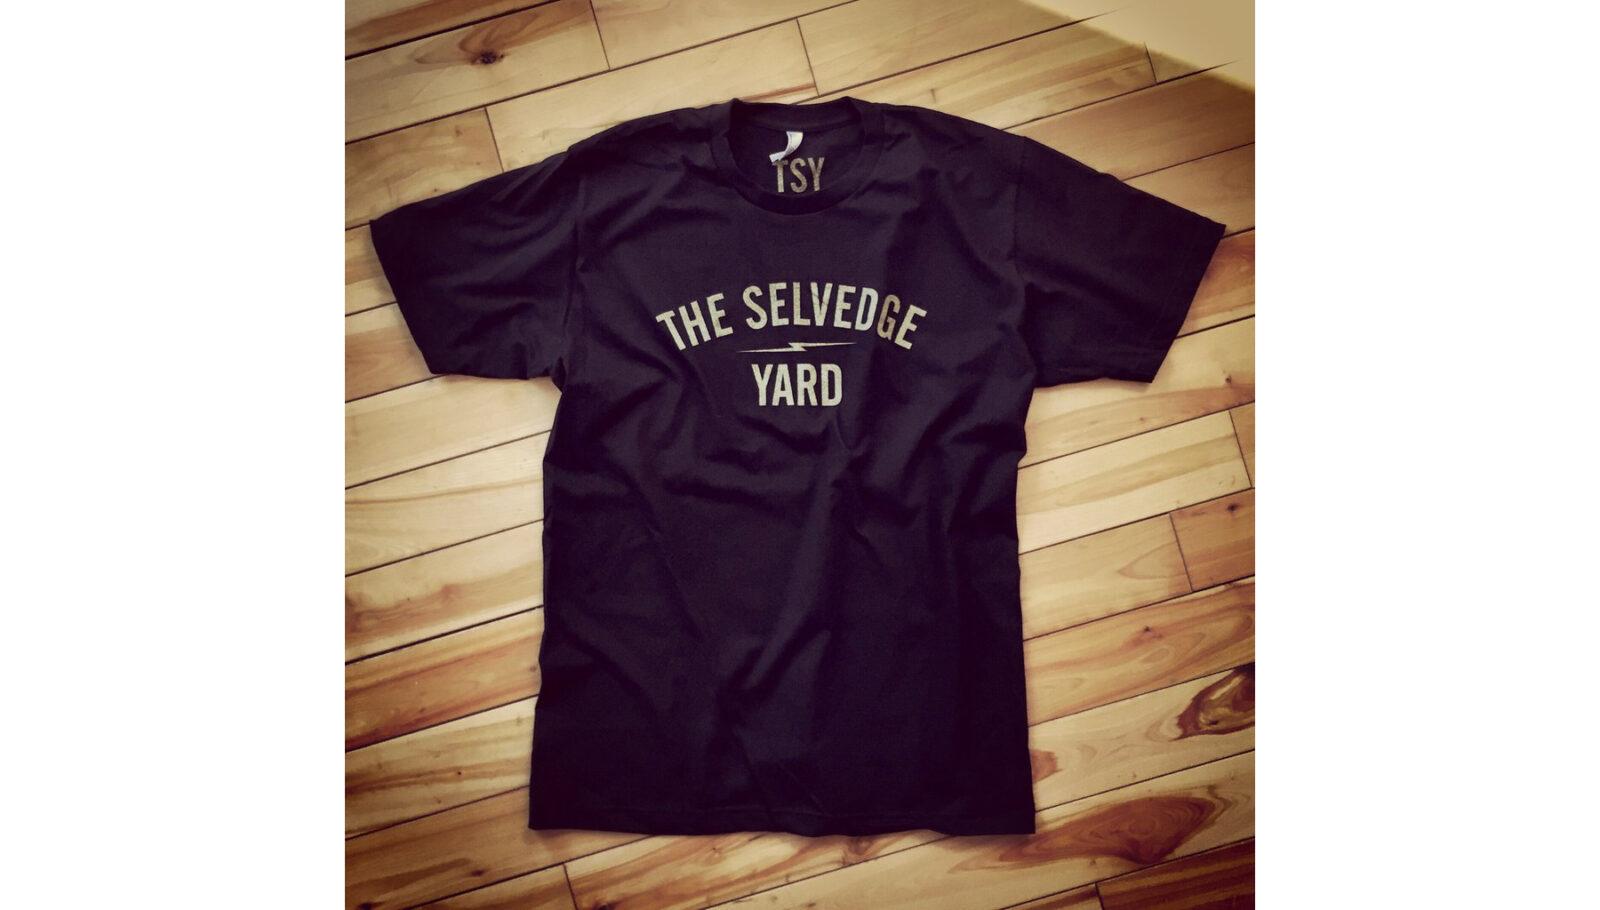 The Selvedge Yard Tee 1600x910 - The Selvedge Yard Tee